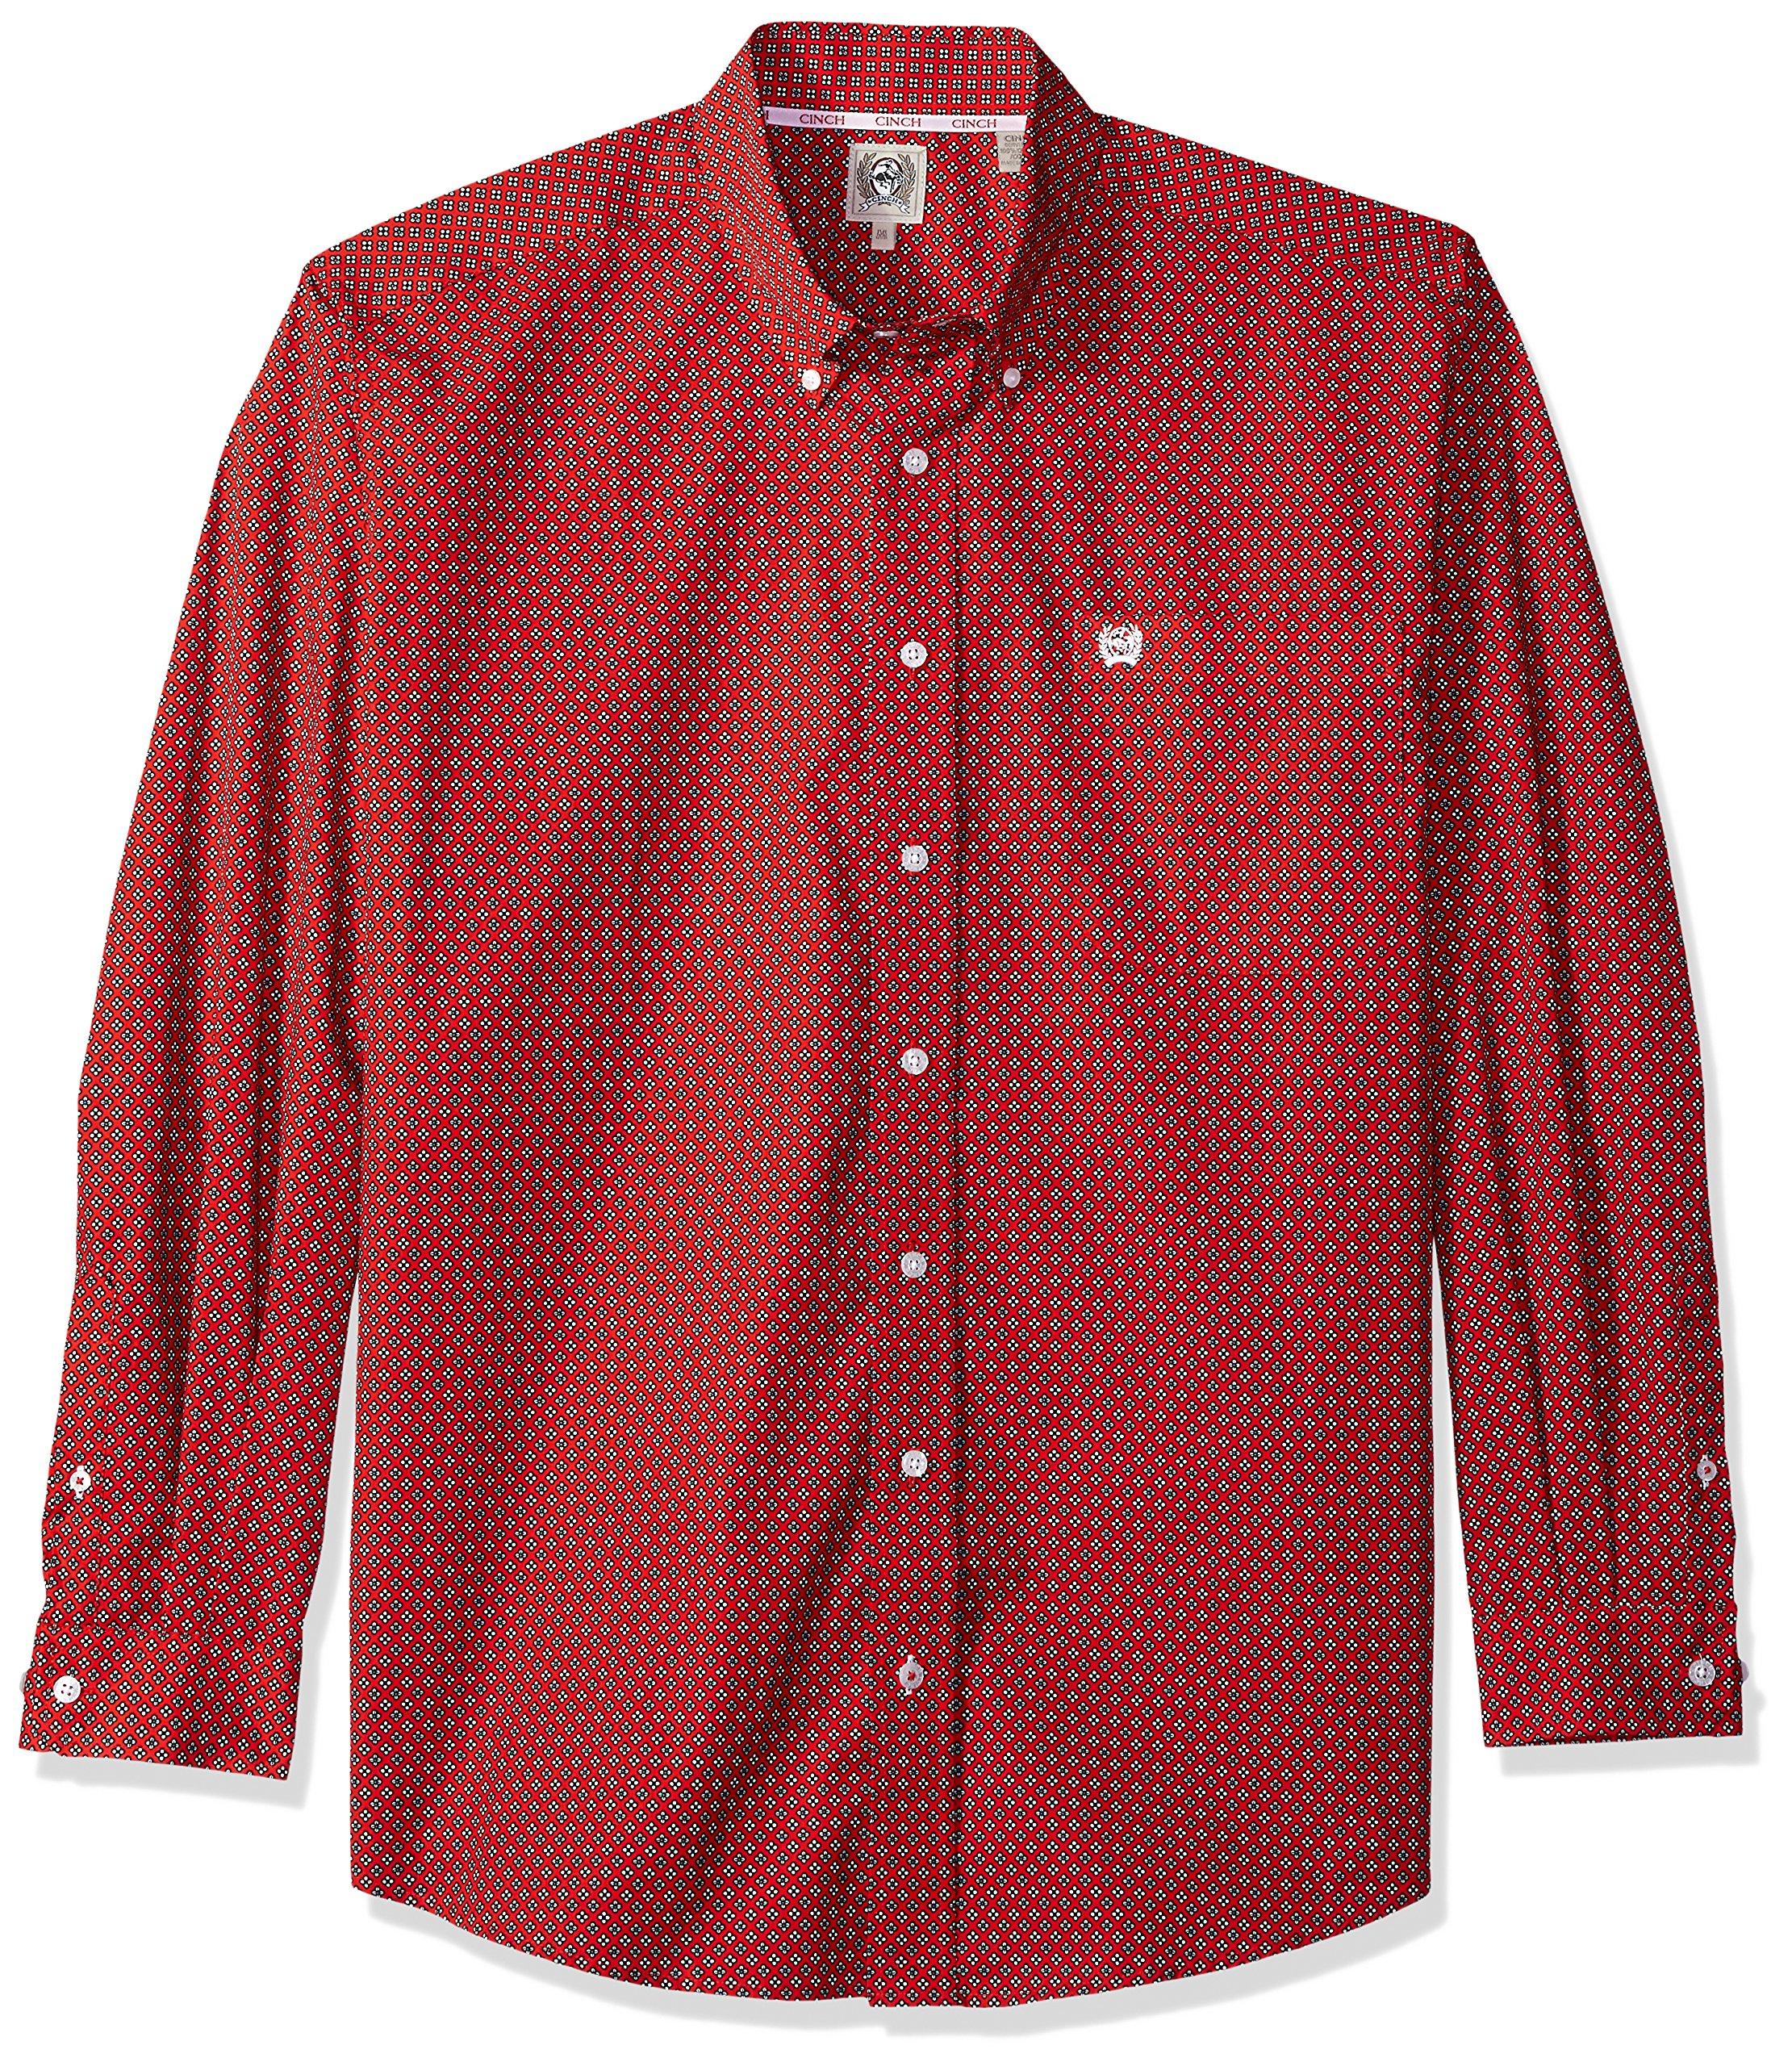 Cinch Men's Classic Fit Long Sleeve Button One Open Pocket Print Shirt, Red Flower, XL